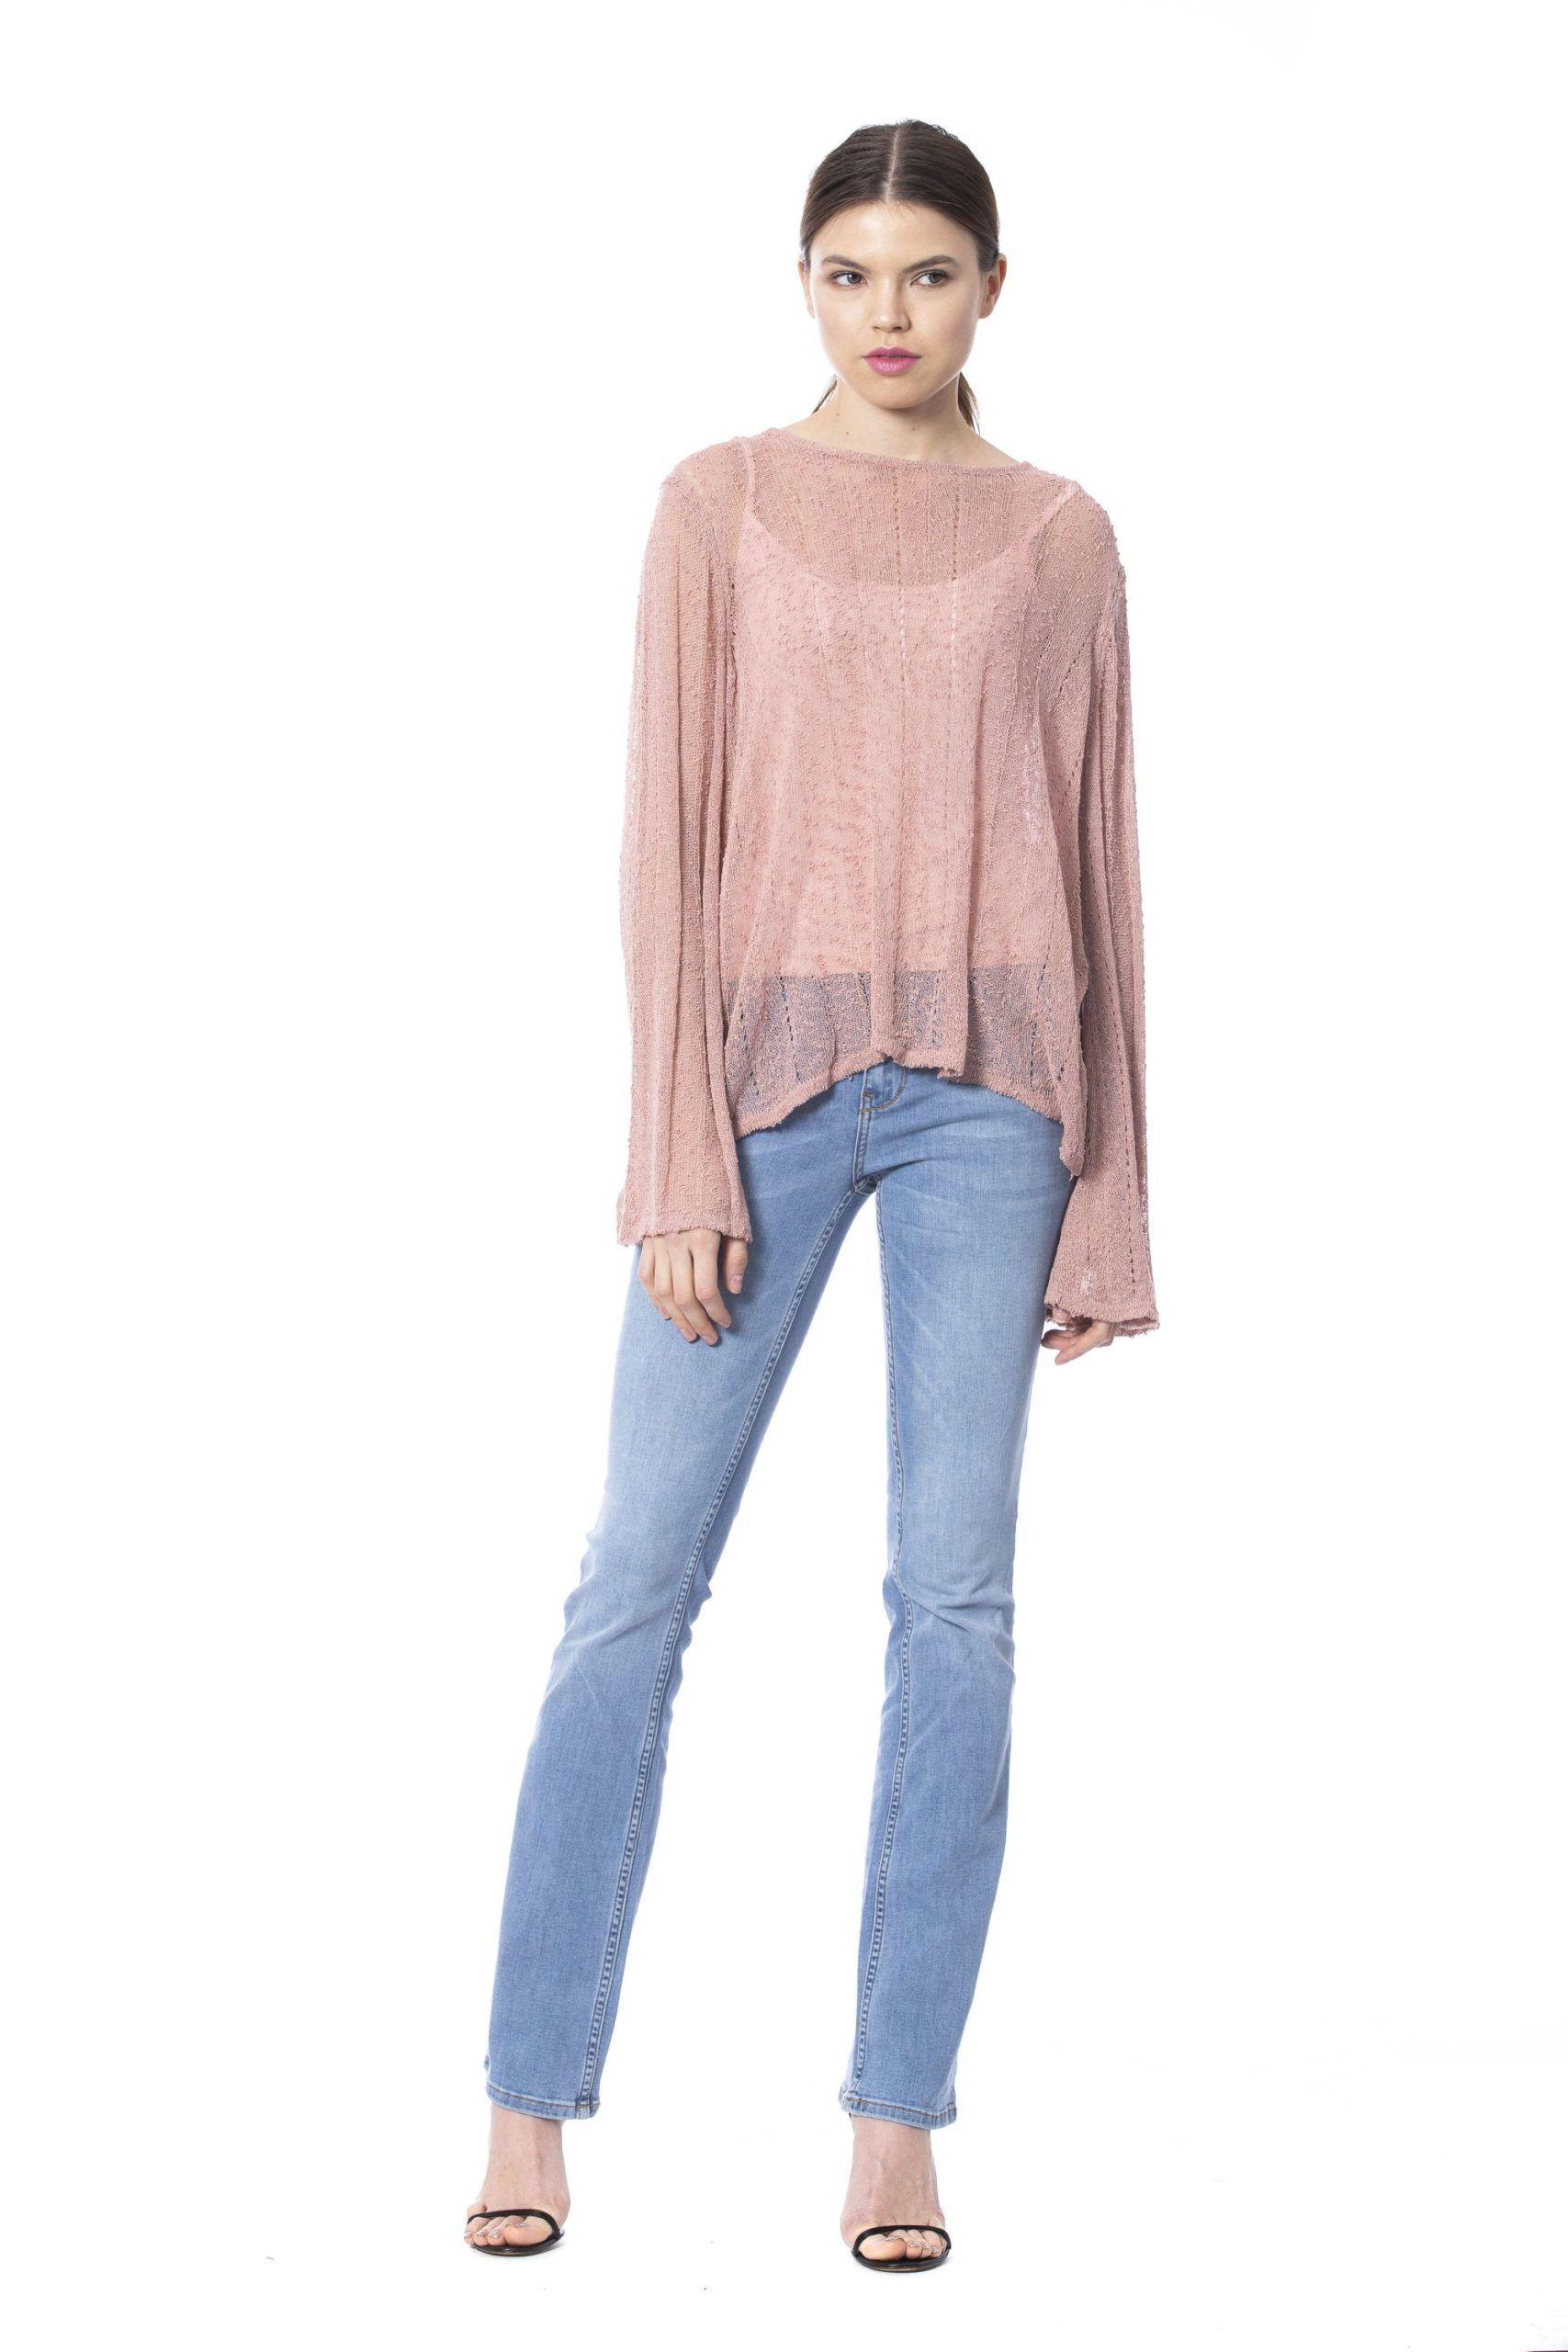 Silvian Heach Pinkpeach Sweater